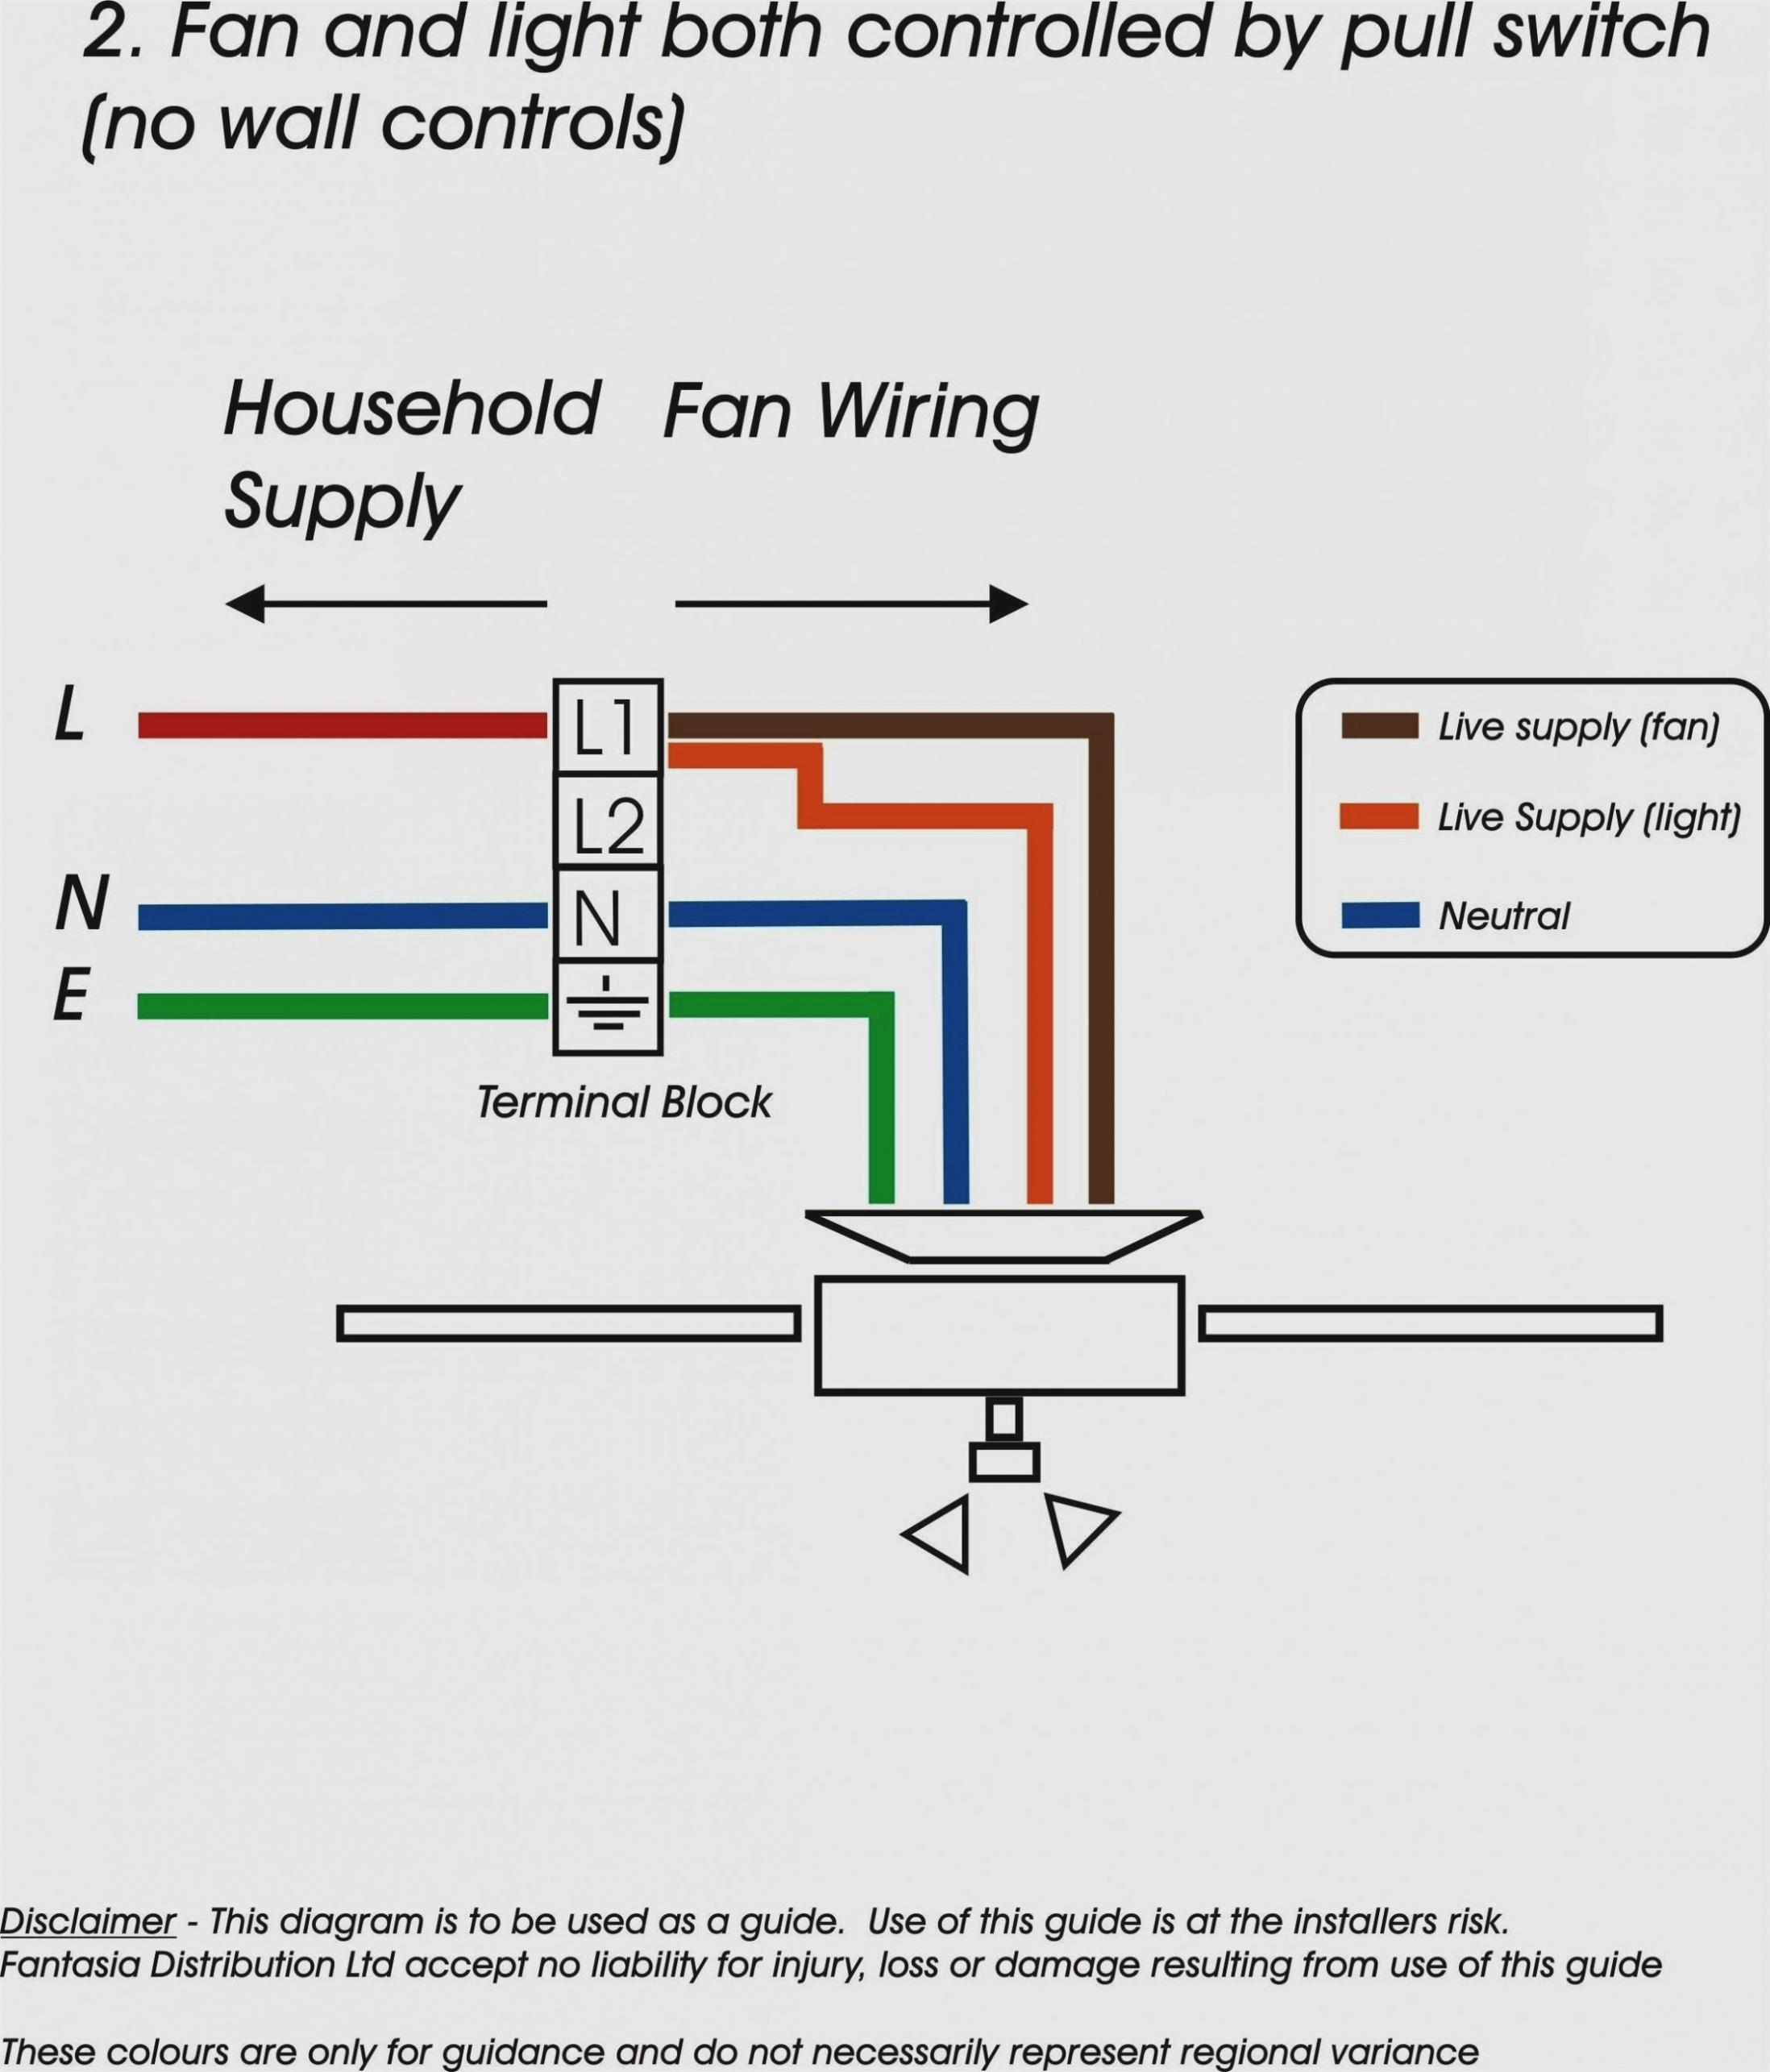 Oscillating Fan Wiring - Wiring Diagrams Hubs - Hunter 3 Speed Fan Switch Wiring Diagram